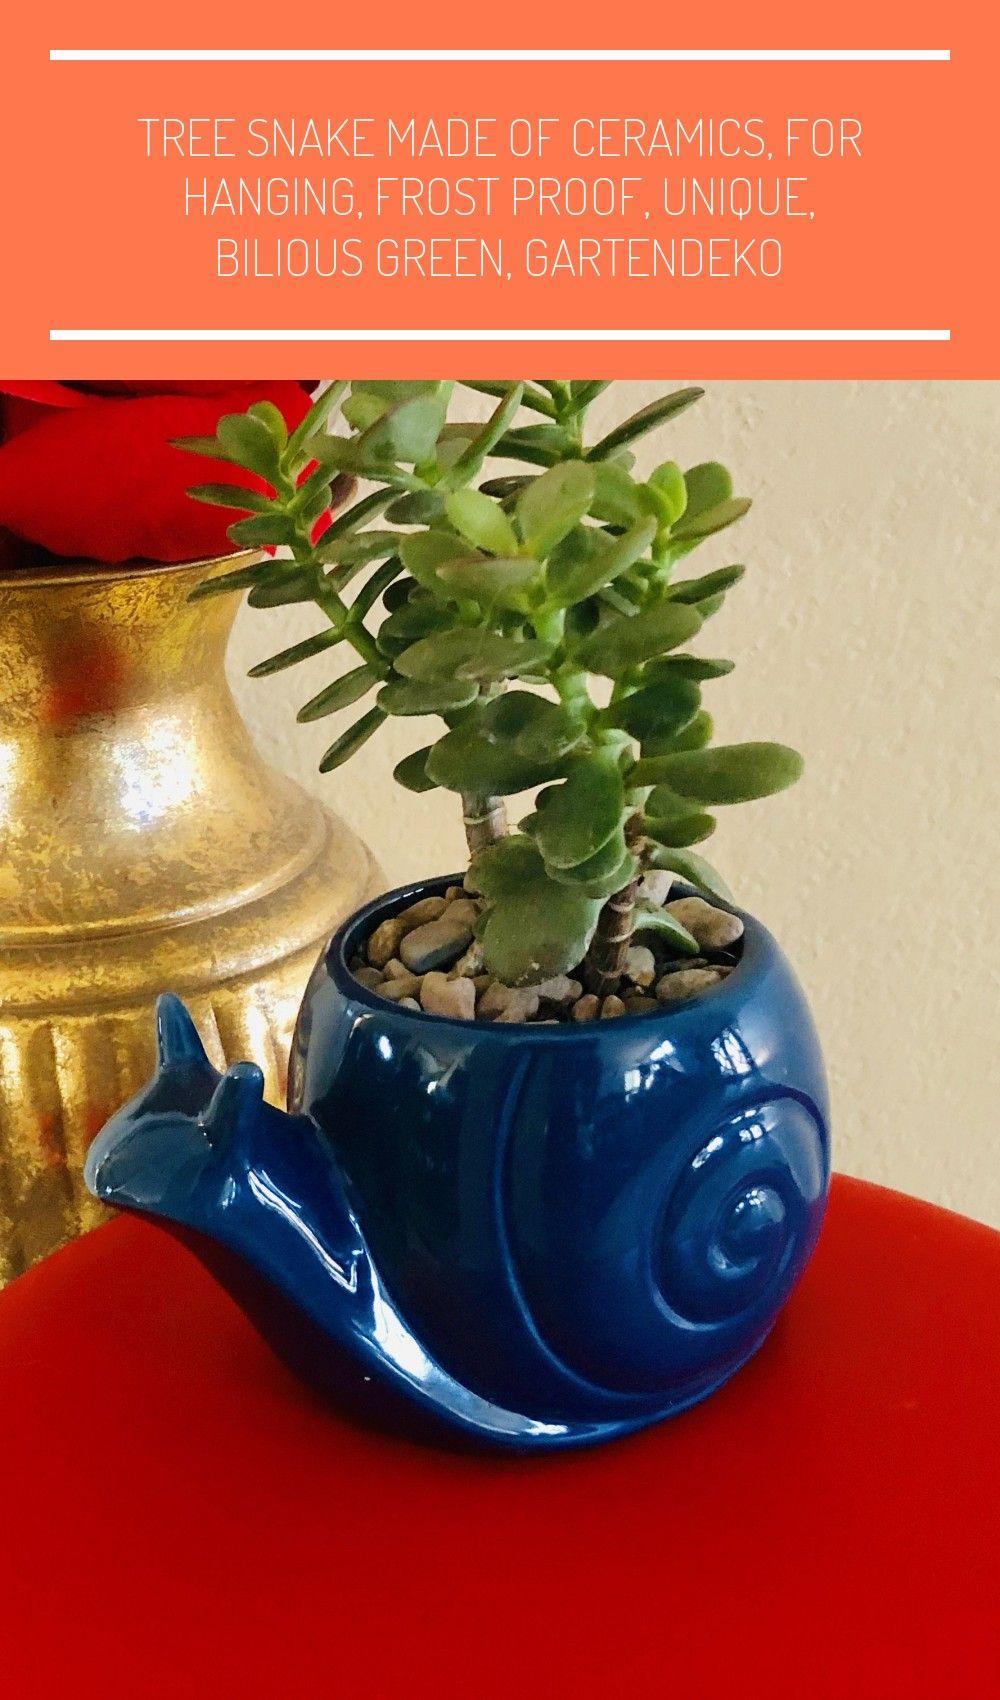 Blue Ceramic Snail Planter #JadePlants  #SucculentsGarden  #CrassulaOvata  #PlantingSucculents  #CactusGarden  #Plants  #Succulents  #PlantingFlowers  #CactusPlants  #SucculentsInContainers  #SucculentPots  #UnusualPlants  #Suculents  #Houseplants  #PottedPlants  #BonsaiTree  #Bonsai  #Cactus  #HousePlants  #DesertPlants  #CactiAndSucculents  #GardenPlants  #PlantLife #poterie jardin escargot Miniature Jade Plant